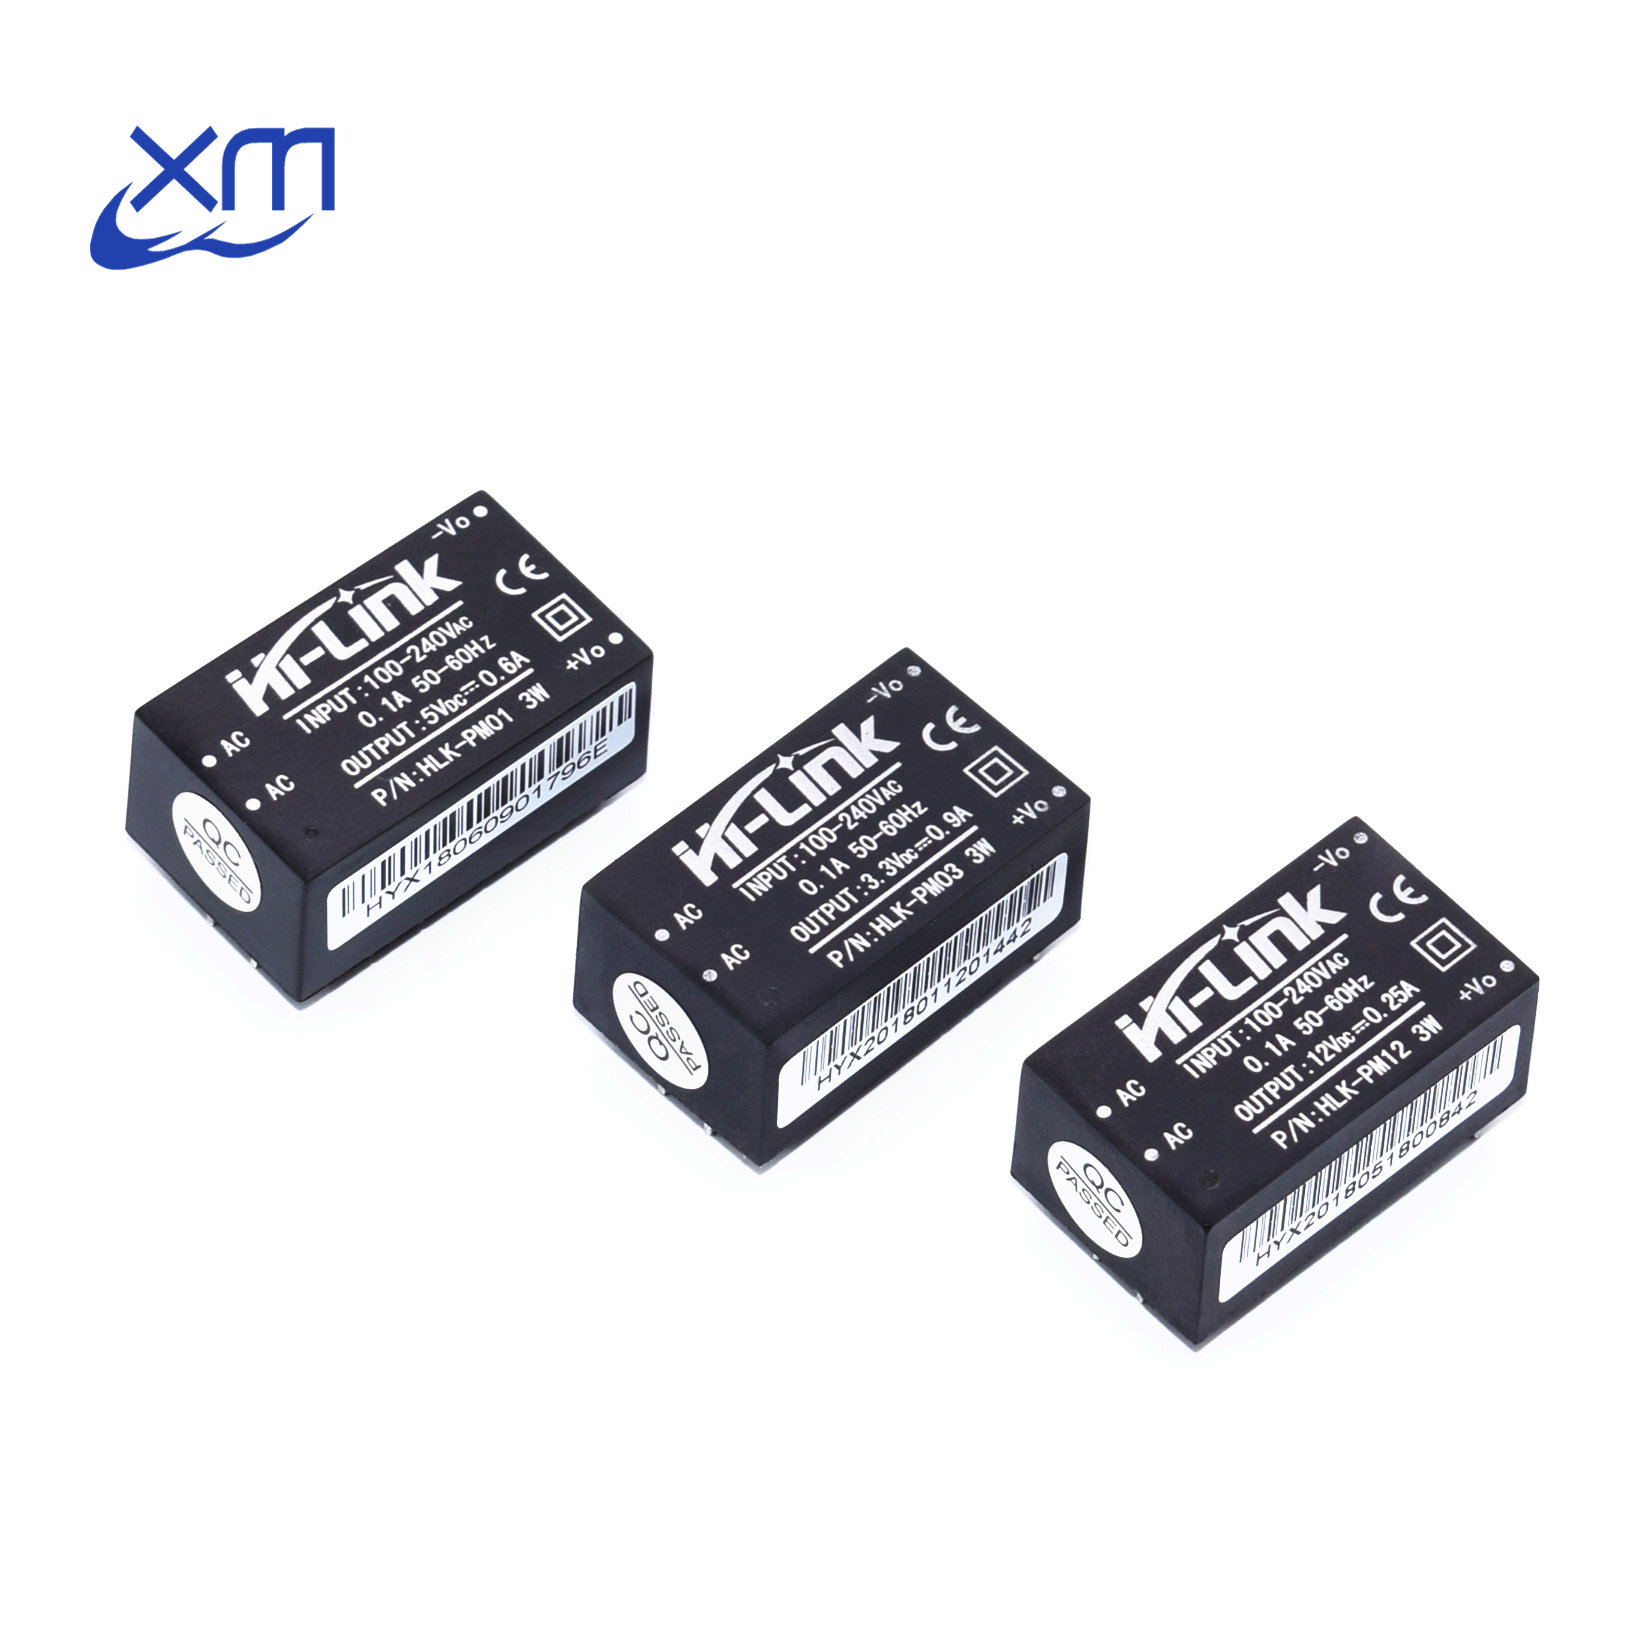 10PCS HLK-PM01 HLK-PM03 HLK-PM12 AC-DC 220V To 5V/3.3V/12V Mini Power Supply Module,intelligent Household Switch Power Module